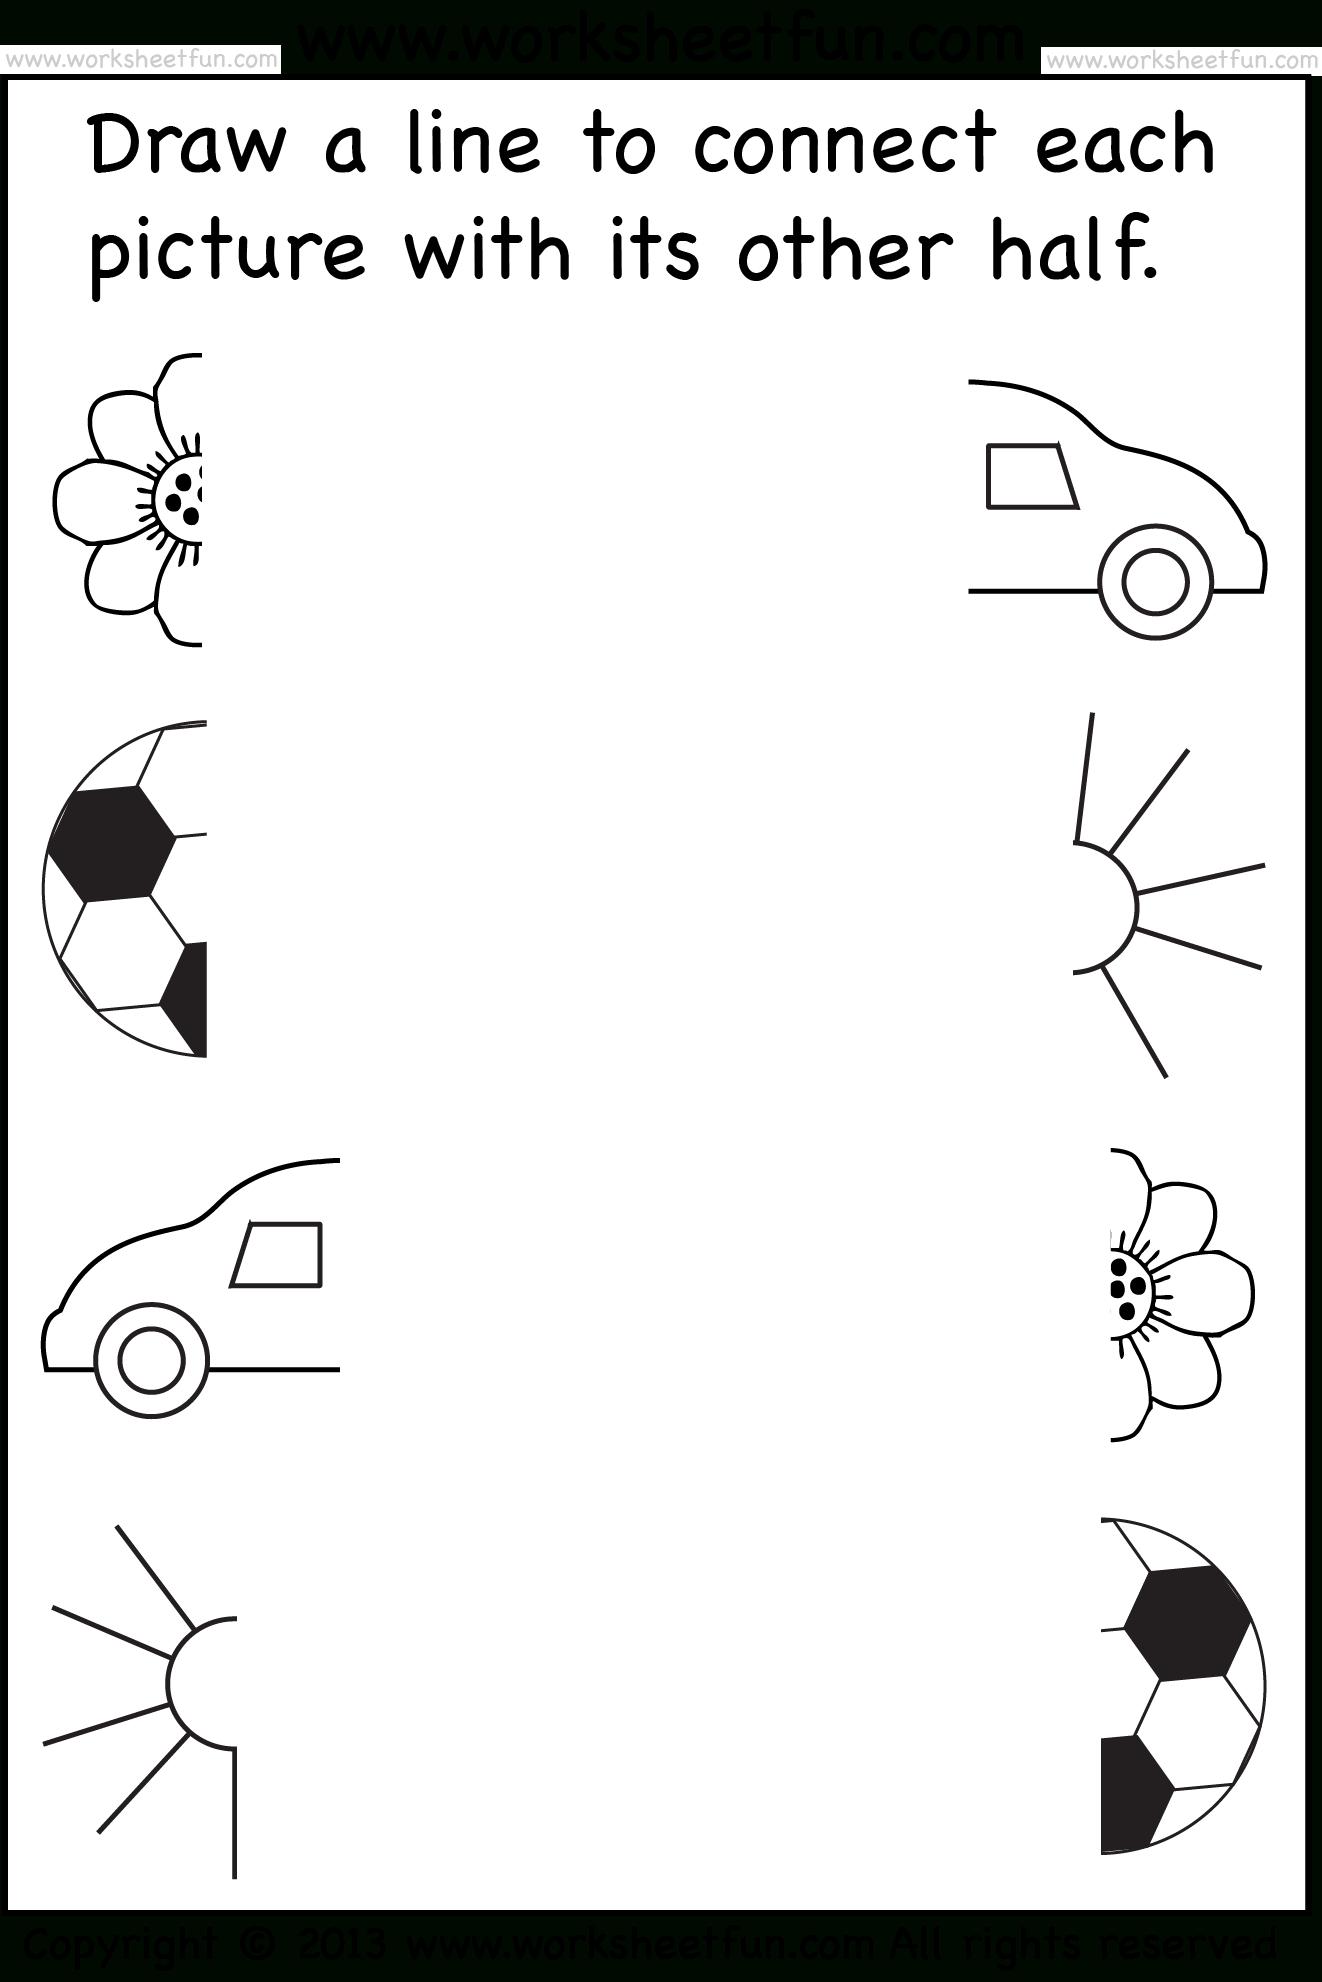 Preschool Worksheets - Connect Pictures - 5 Worksheets